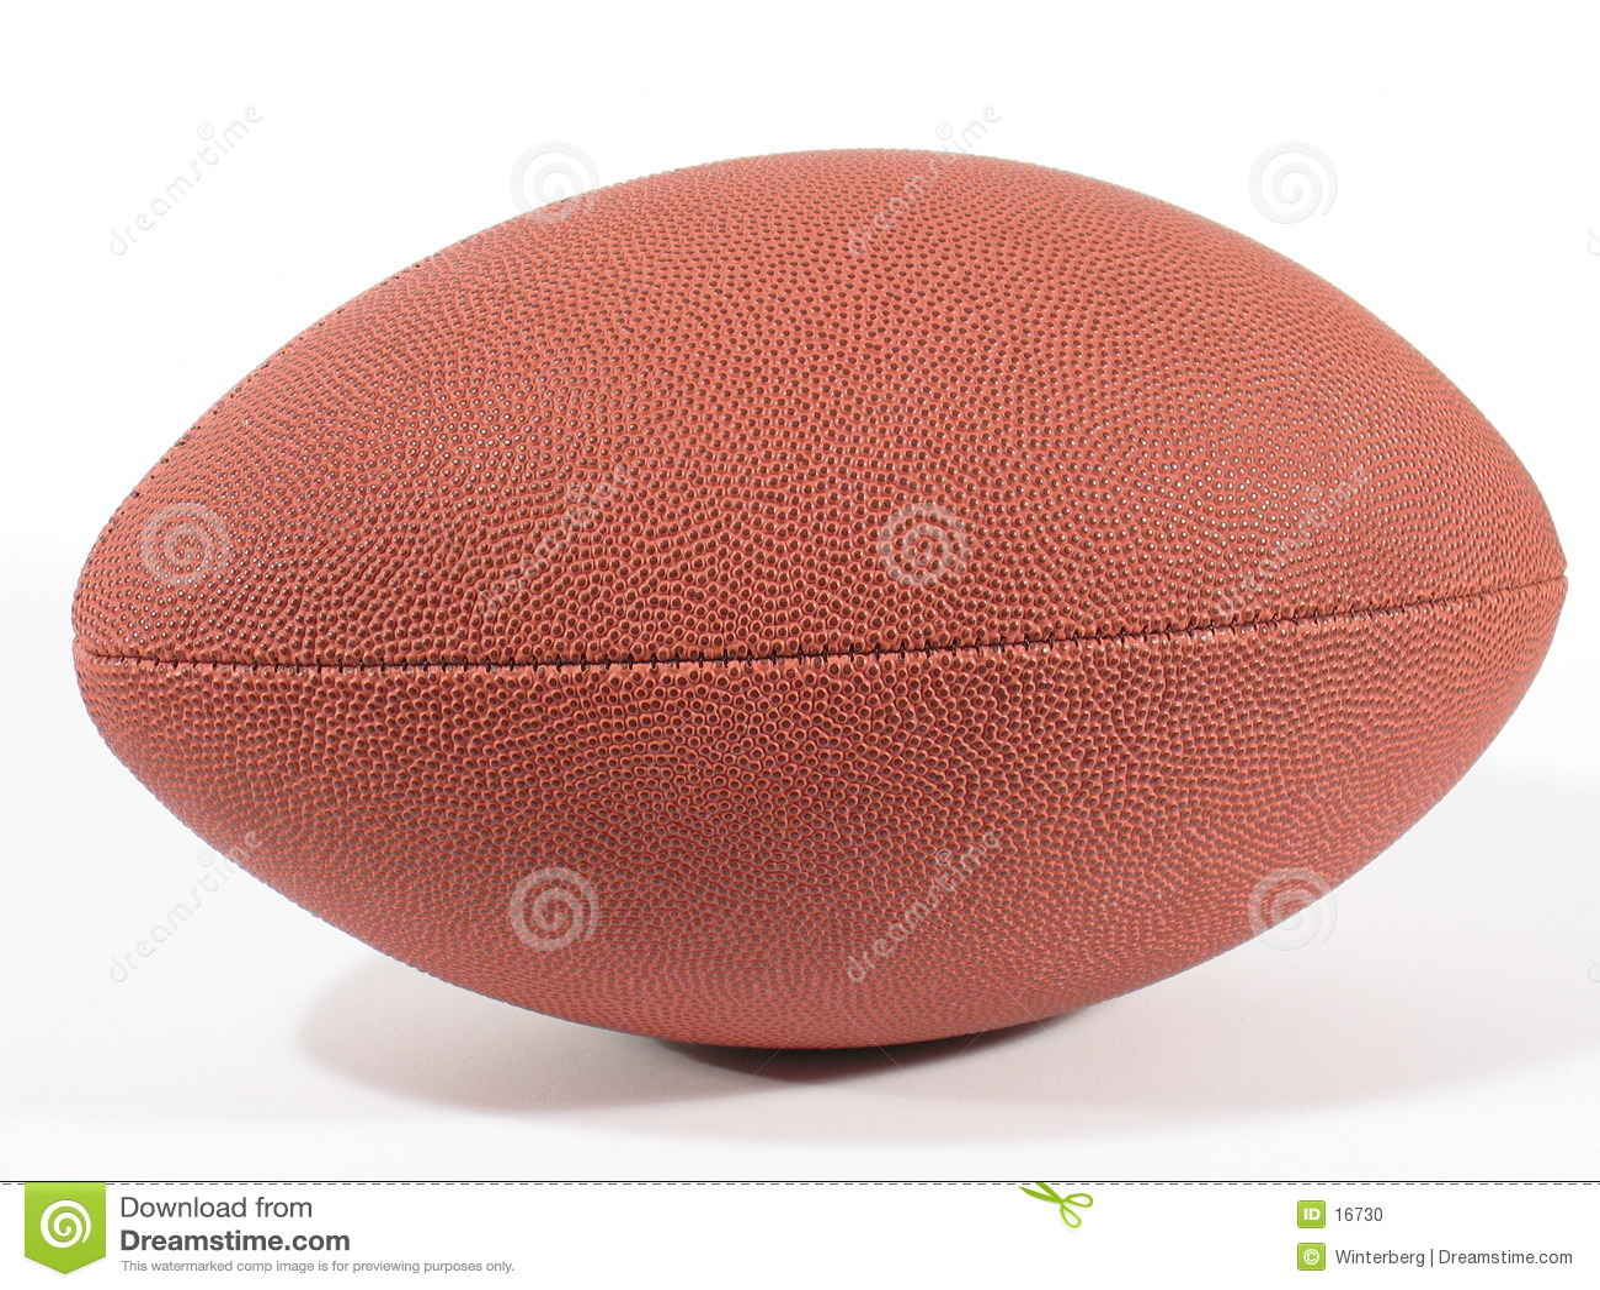 Amerikansk fotboll iii